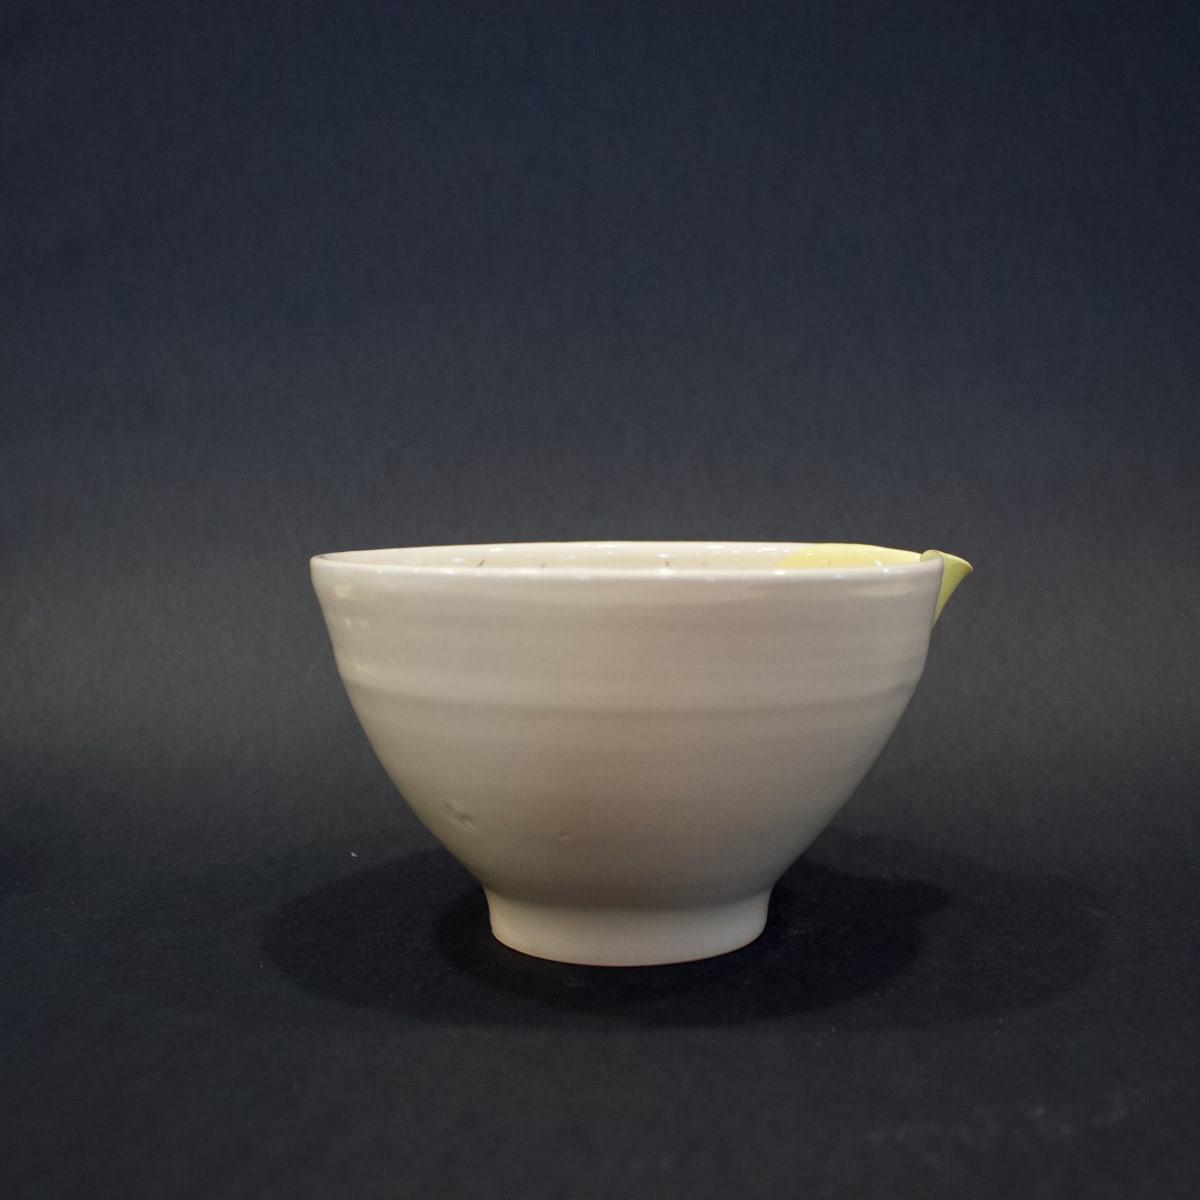 Alice Funge Small Bowl Yellow, 2019 Stoneware 9.5 x 15 x 16 cm 3 3/4 x 5 7/8 x 6 1/4 in